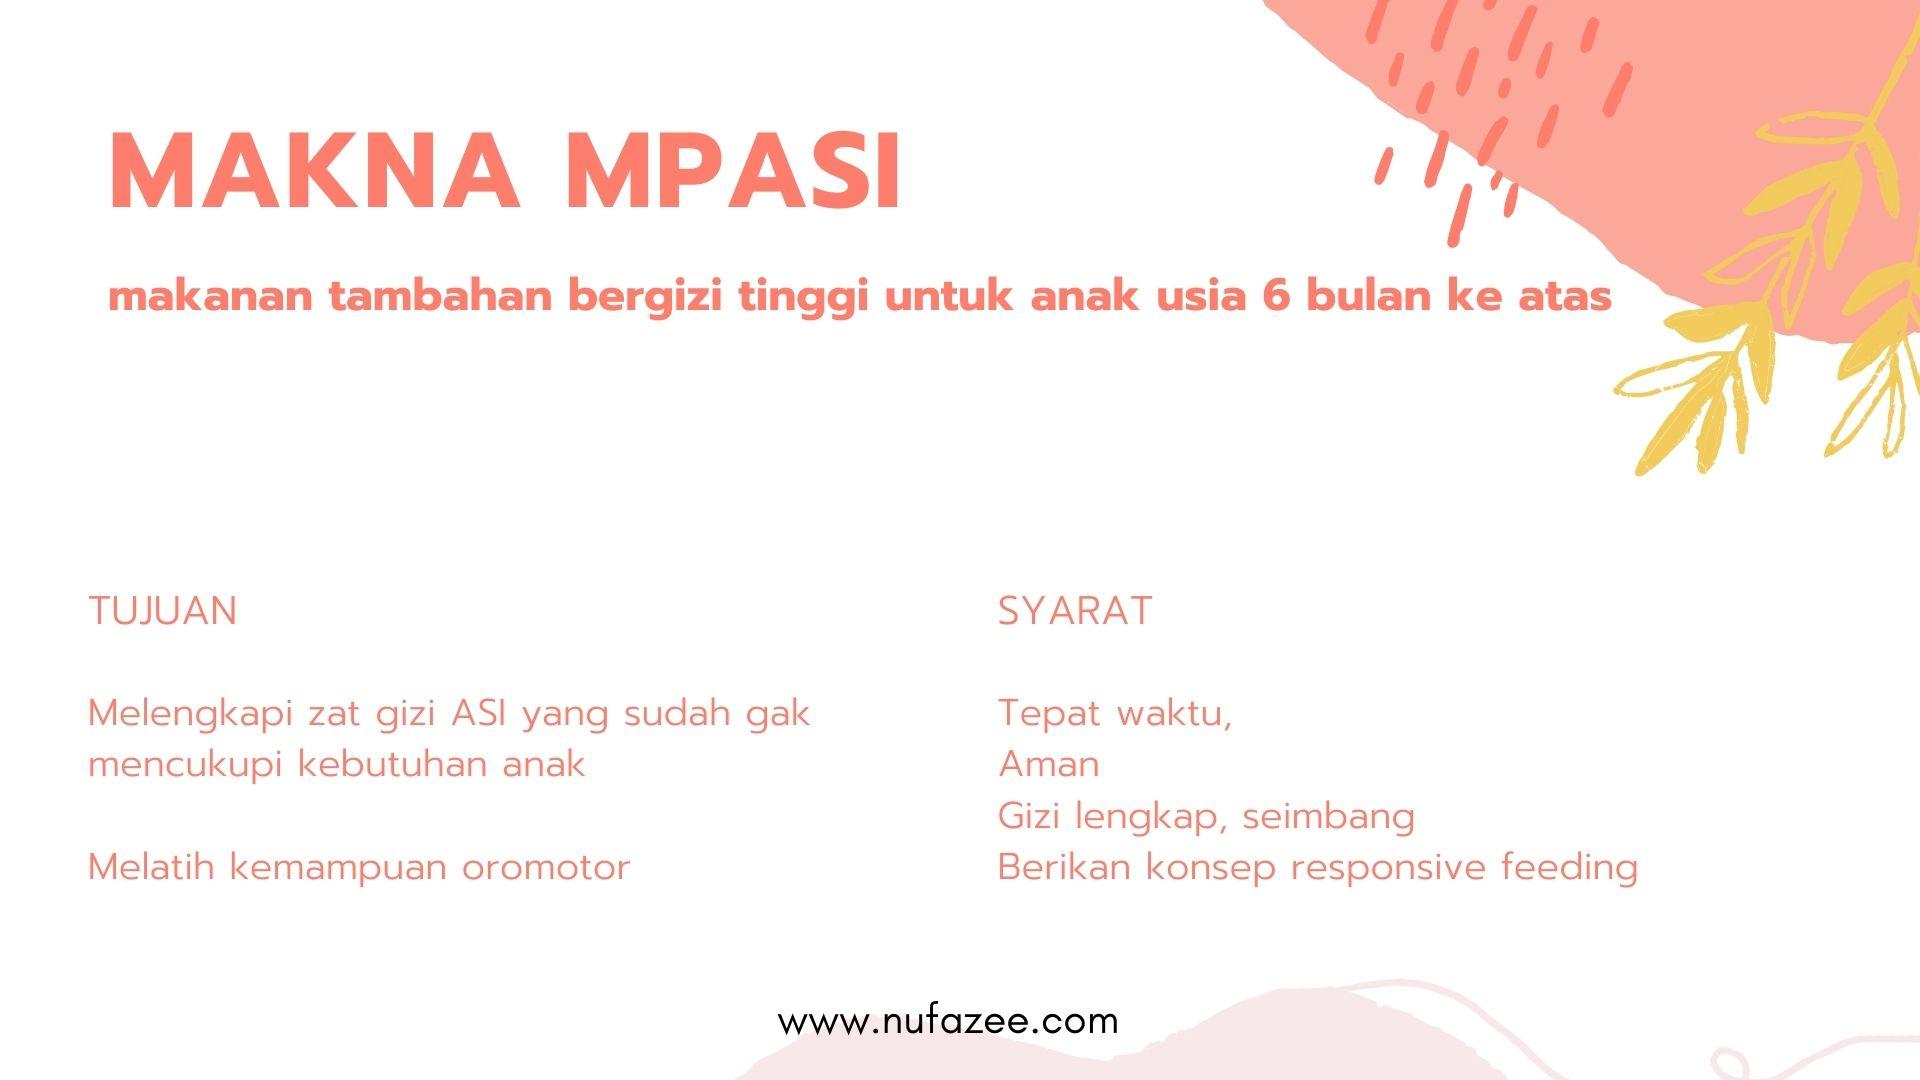 mpasi 5